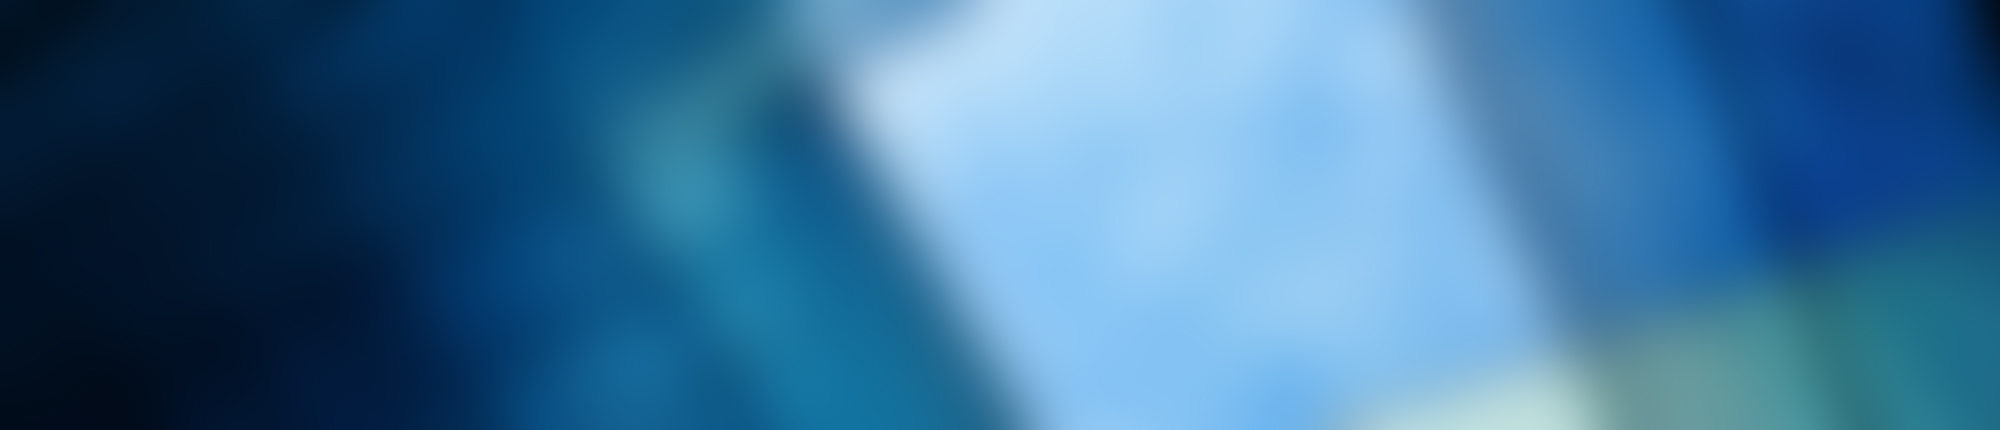 bg-immeubles-blur